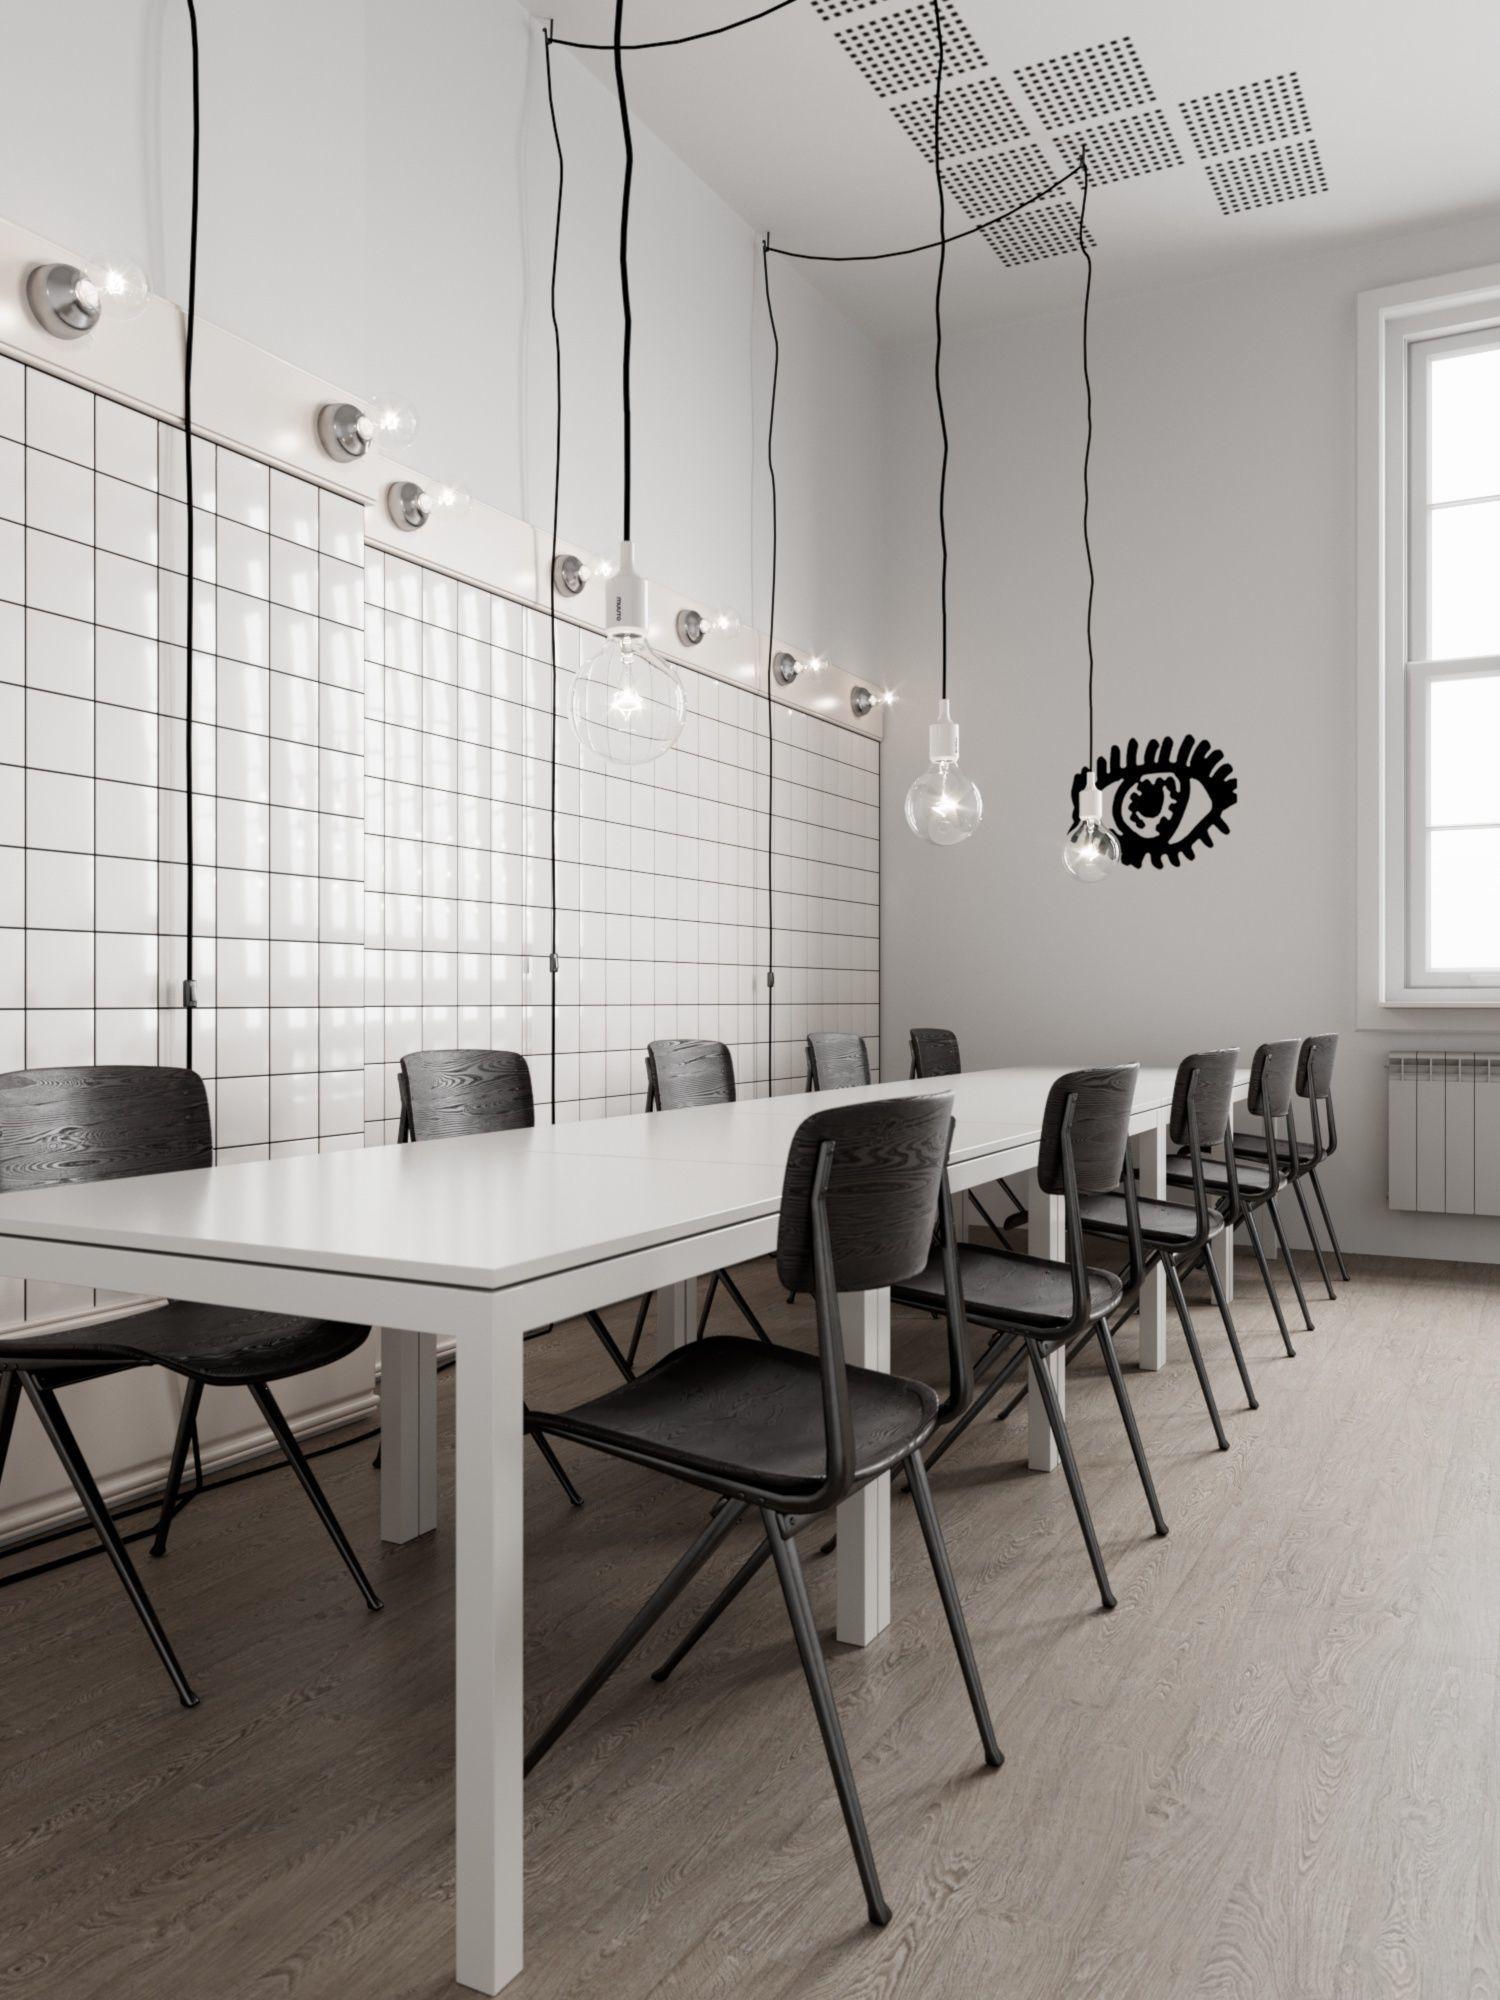 Ikea Chair Scene for Cinema 4D and Corona Renderer | 3D model